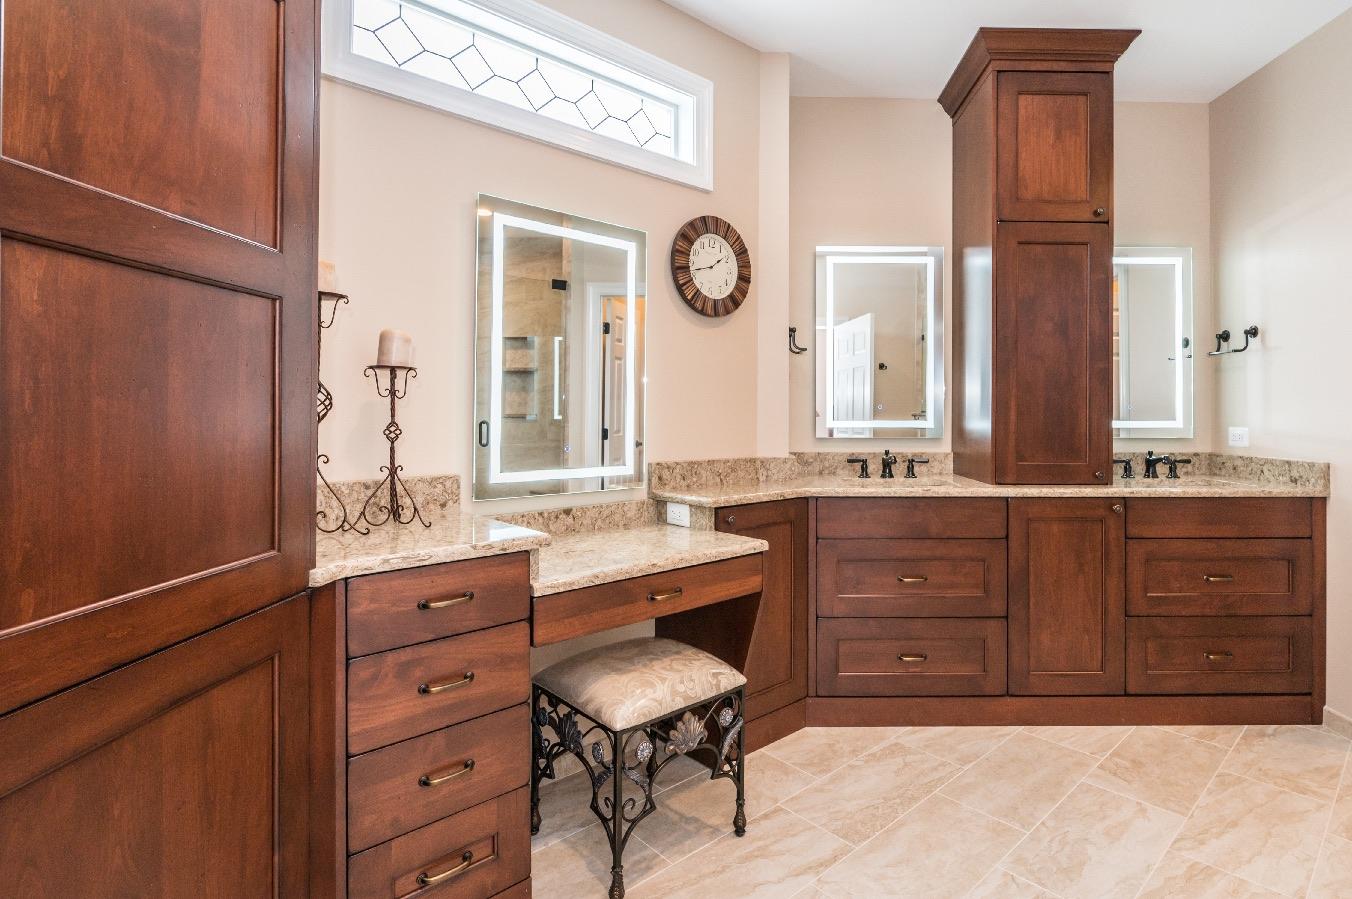 Haymarket Traditional Master Bathroom Remodel is Stunning